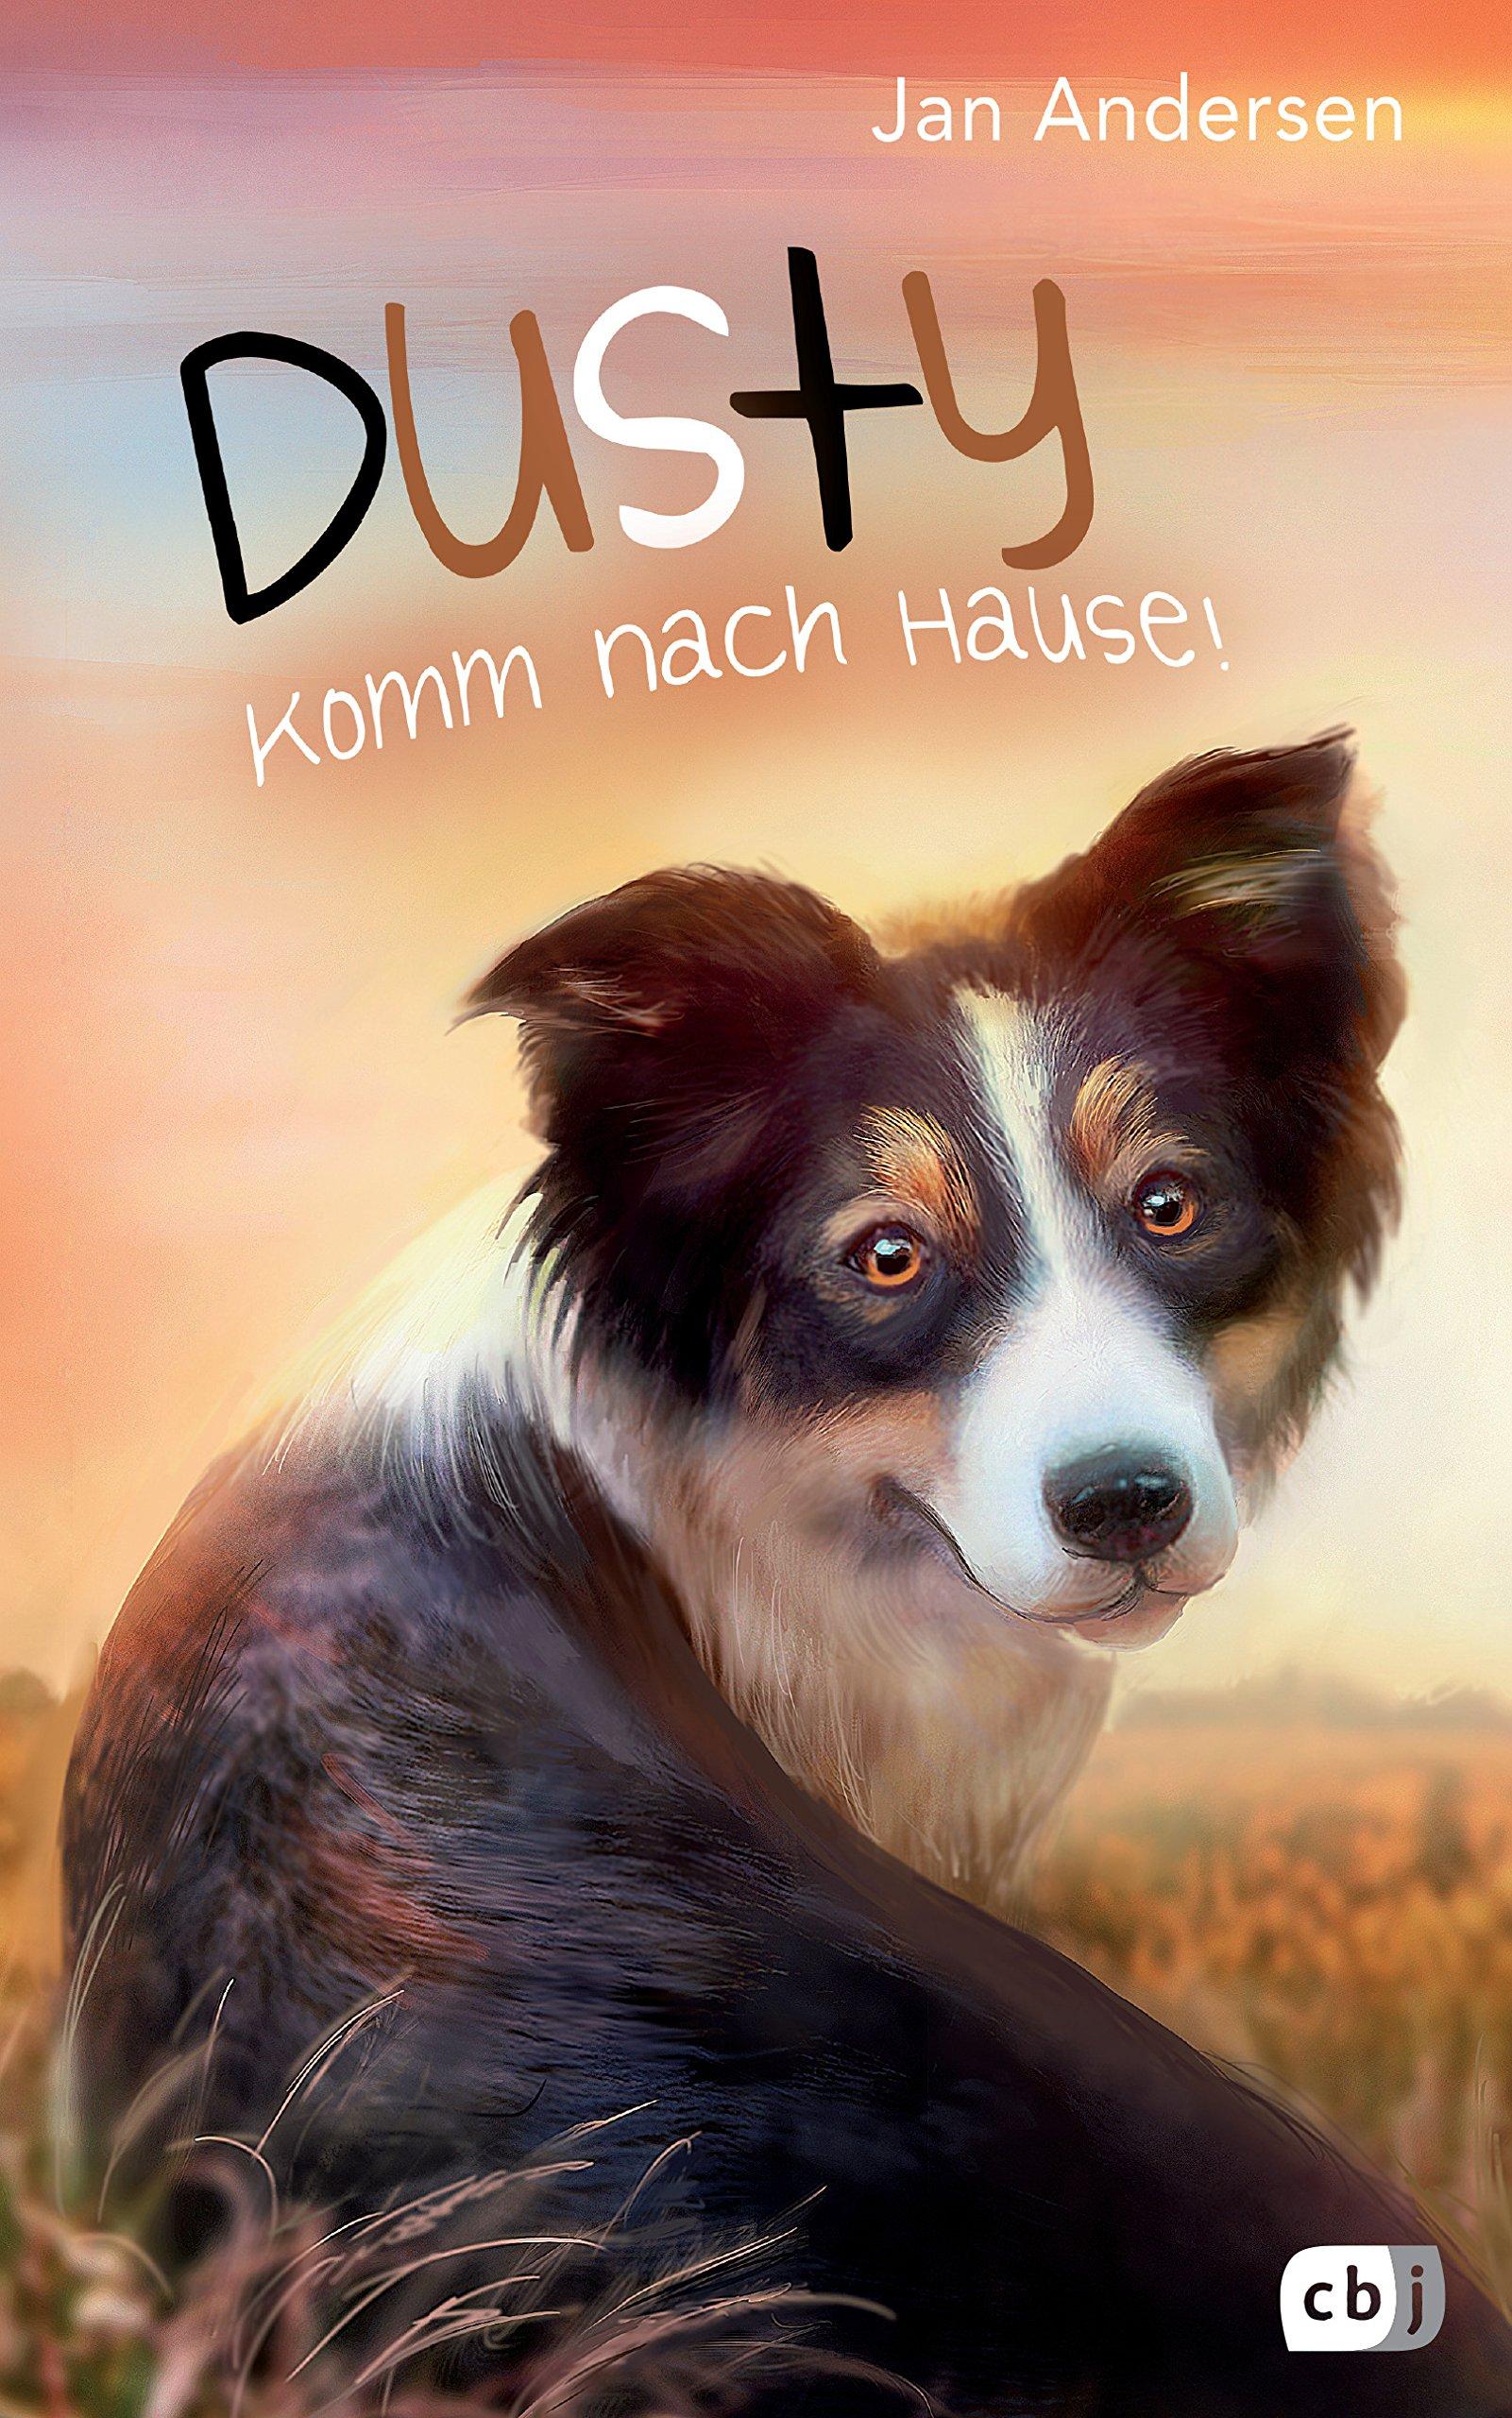 dusty-komm-nach-hause-die-dusty-reihe-band-3